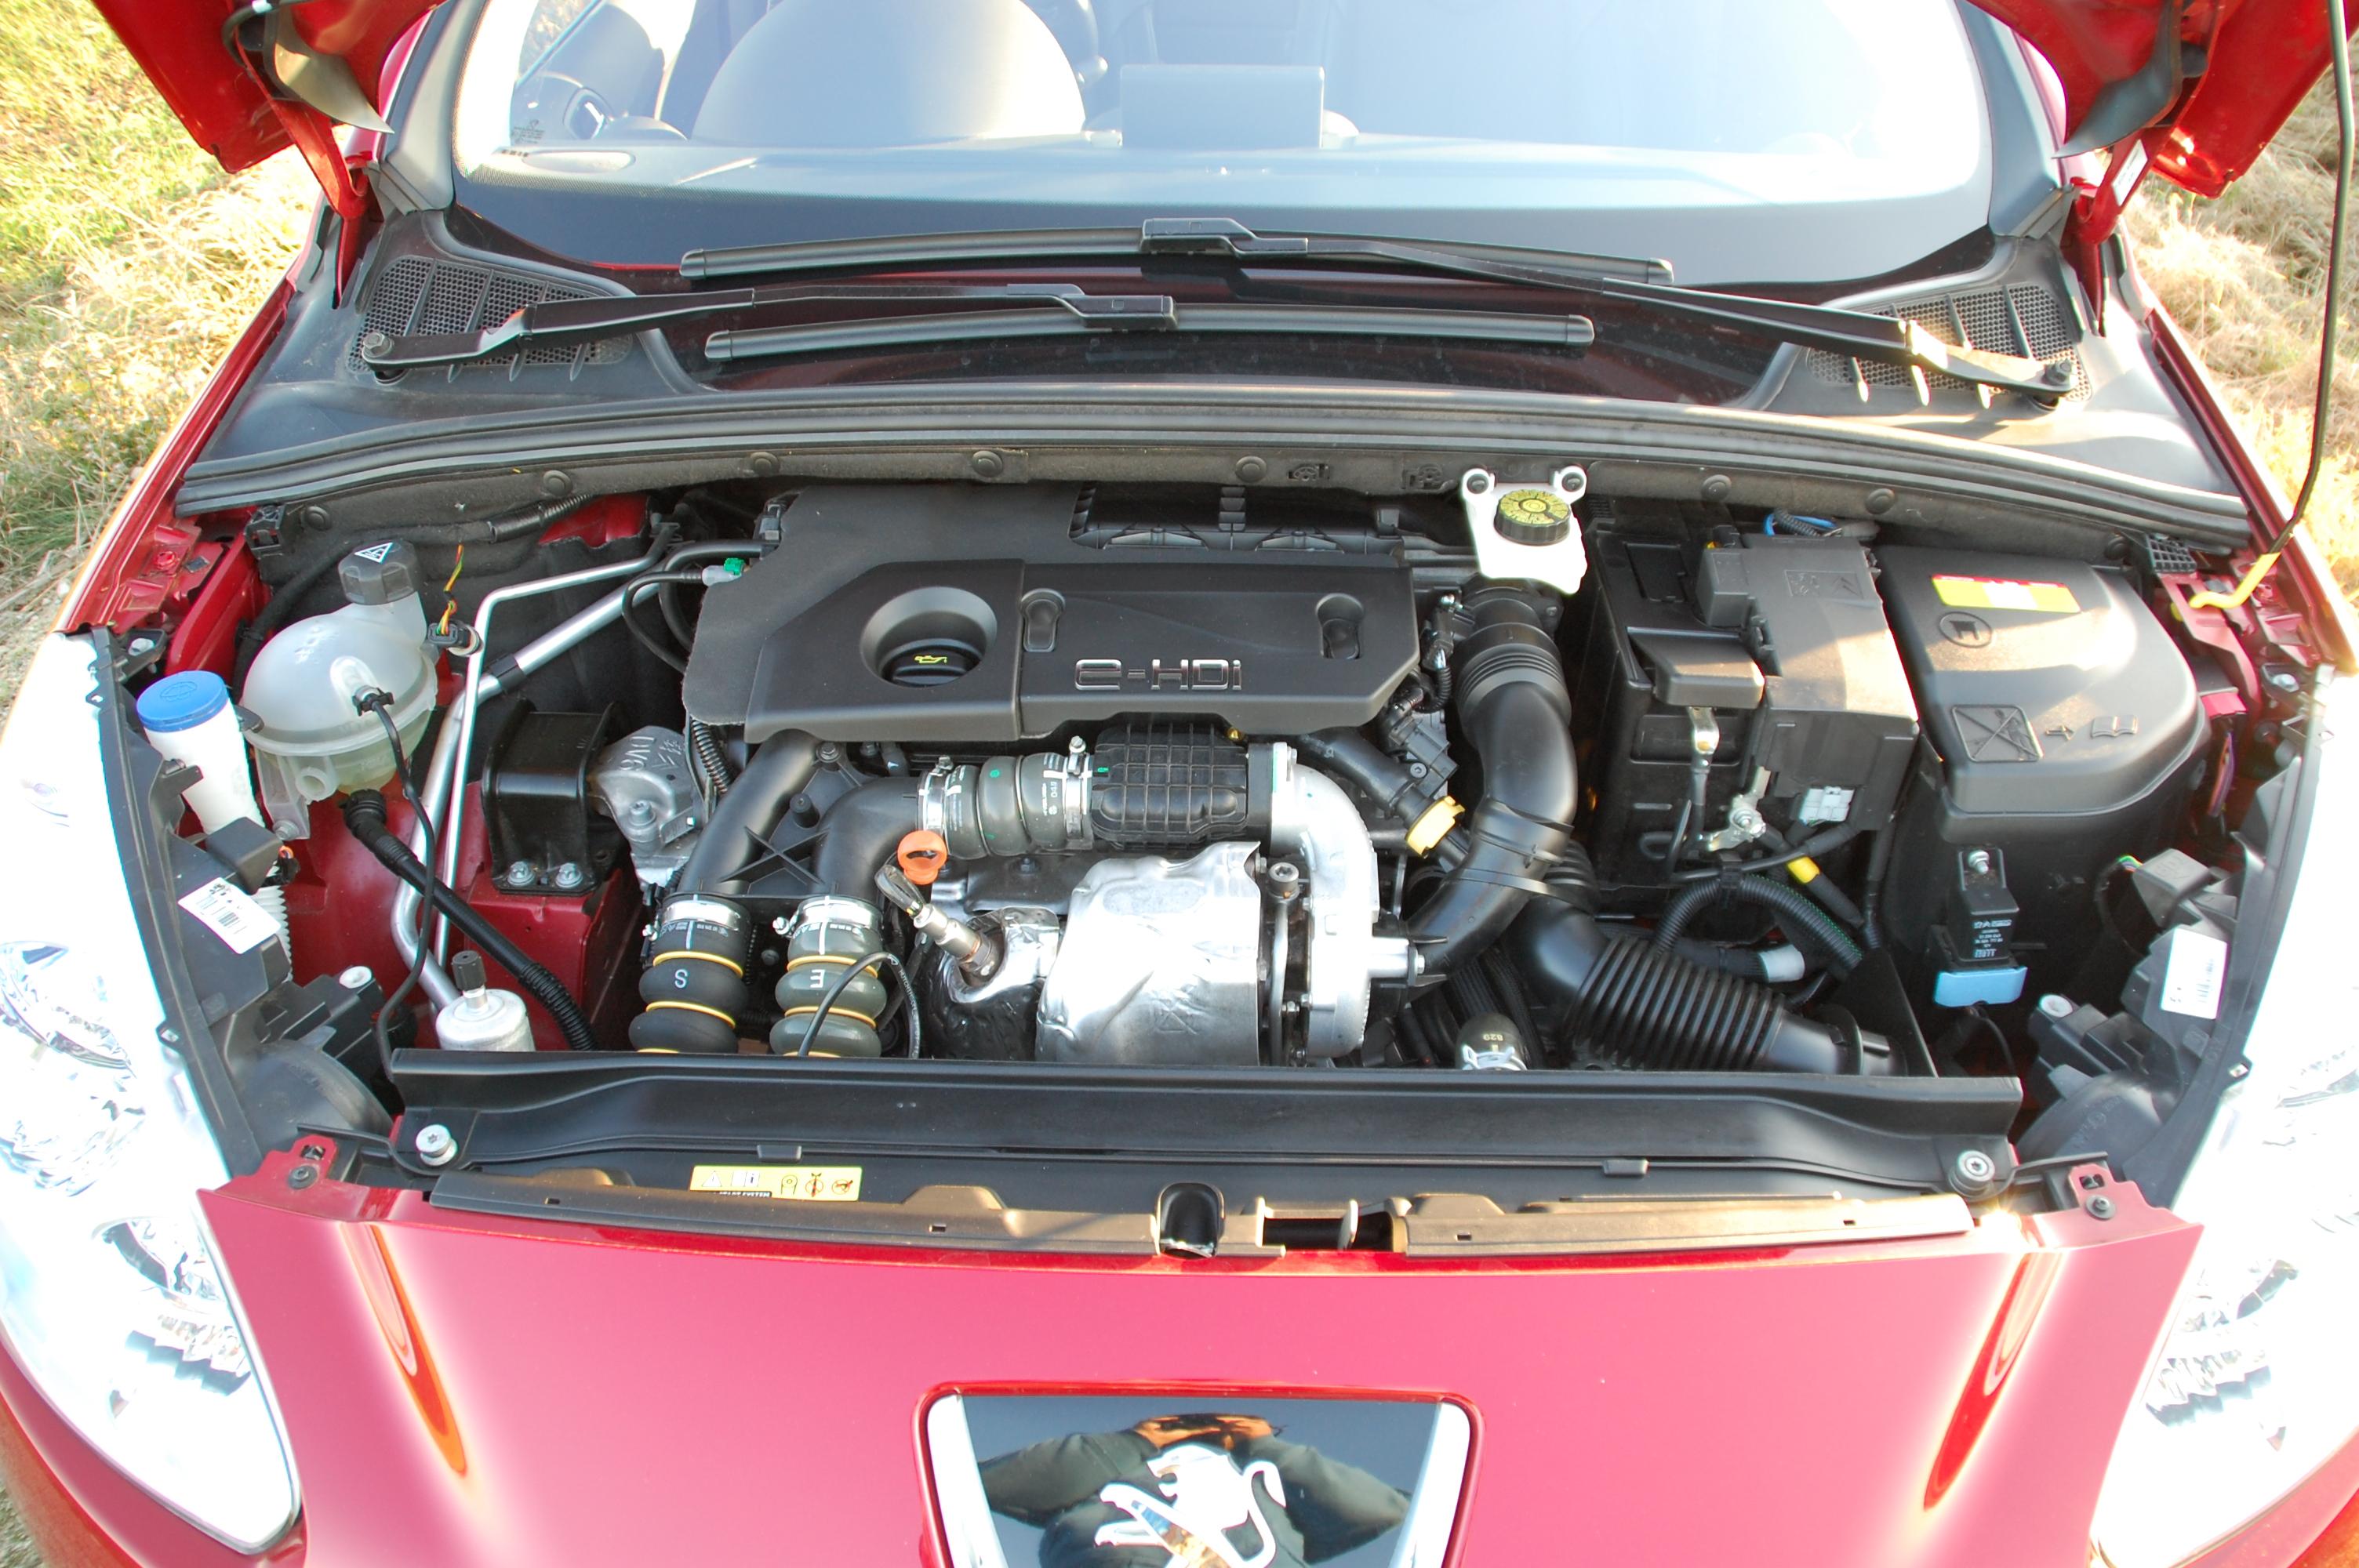 Peugeot 308 Allure e-HDi 112 Stop and Start Road Test « Petroleum Vitae